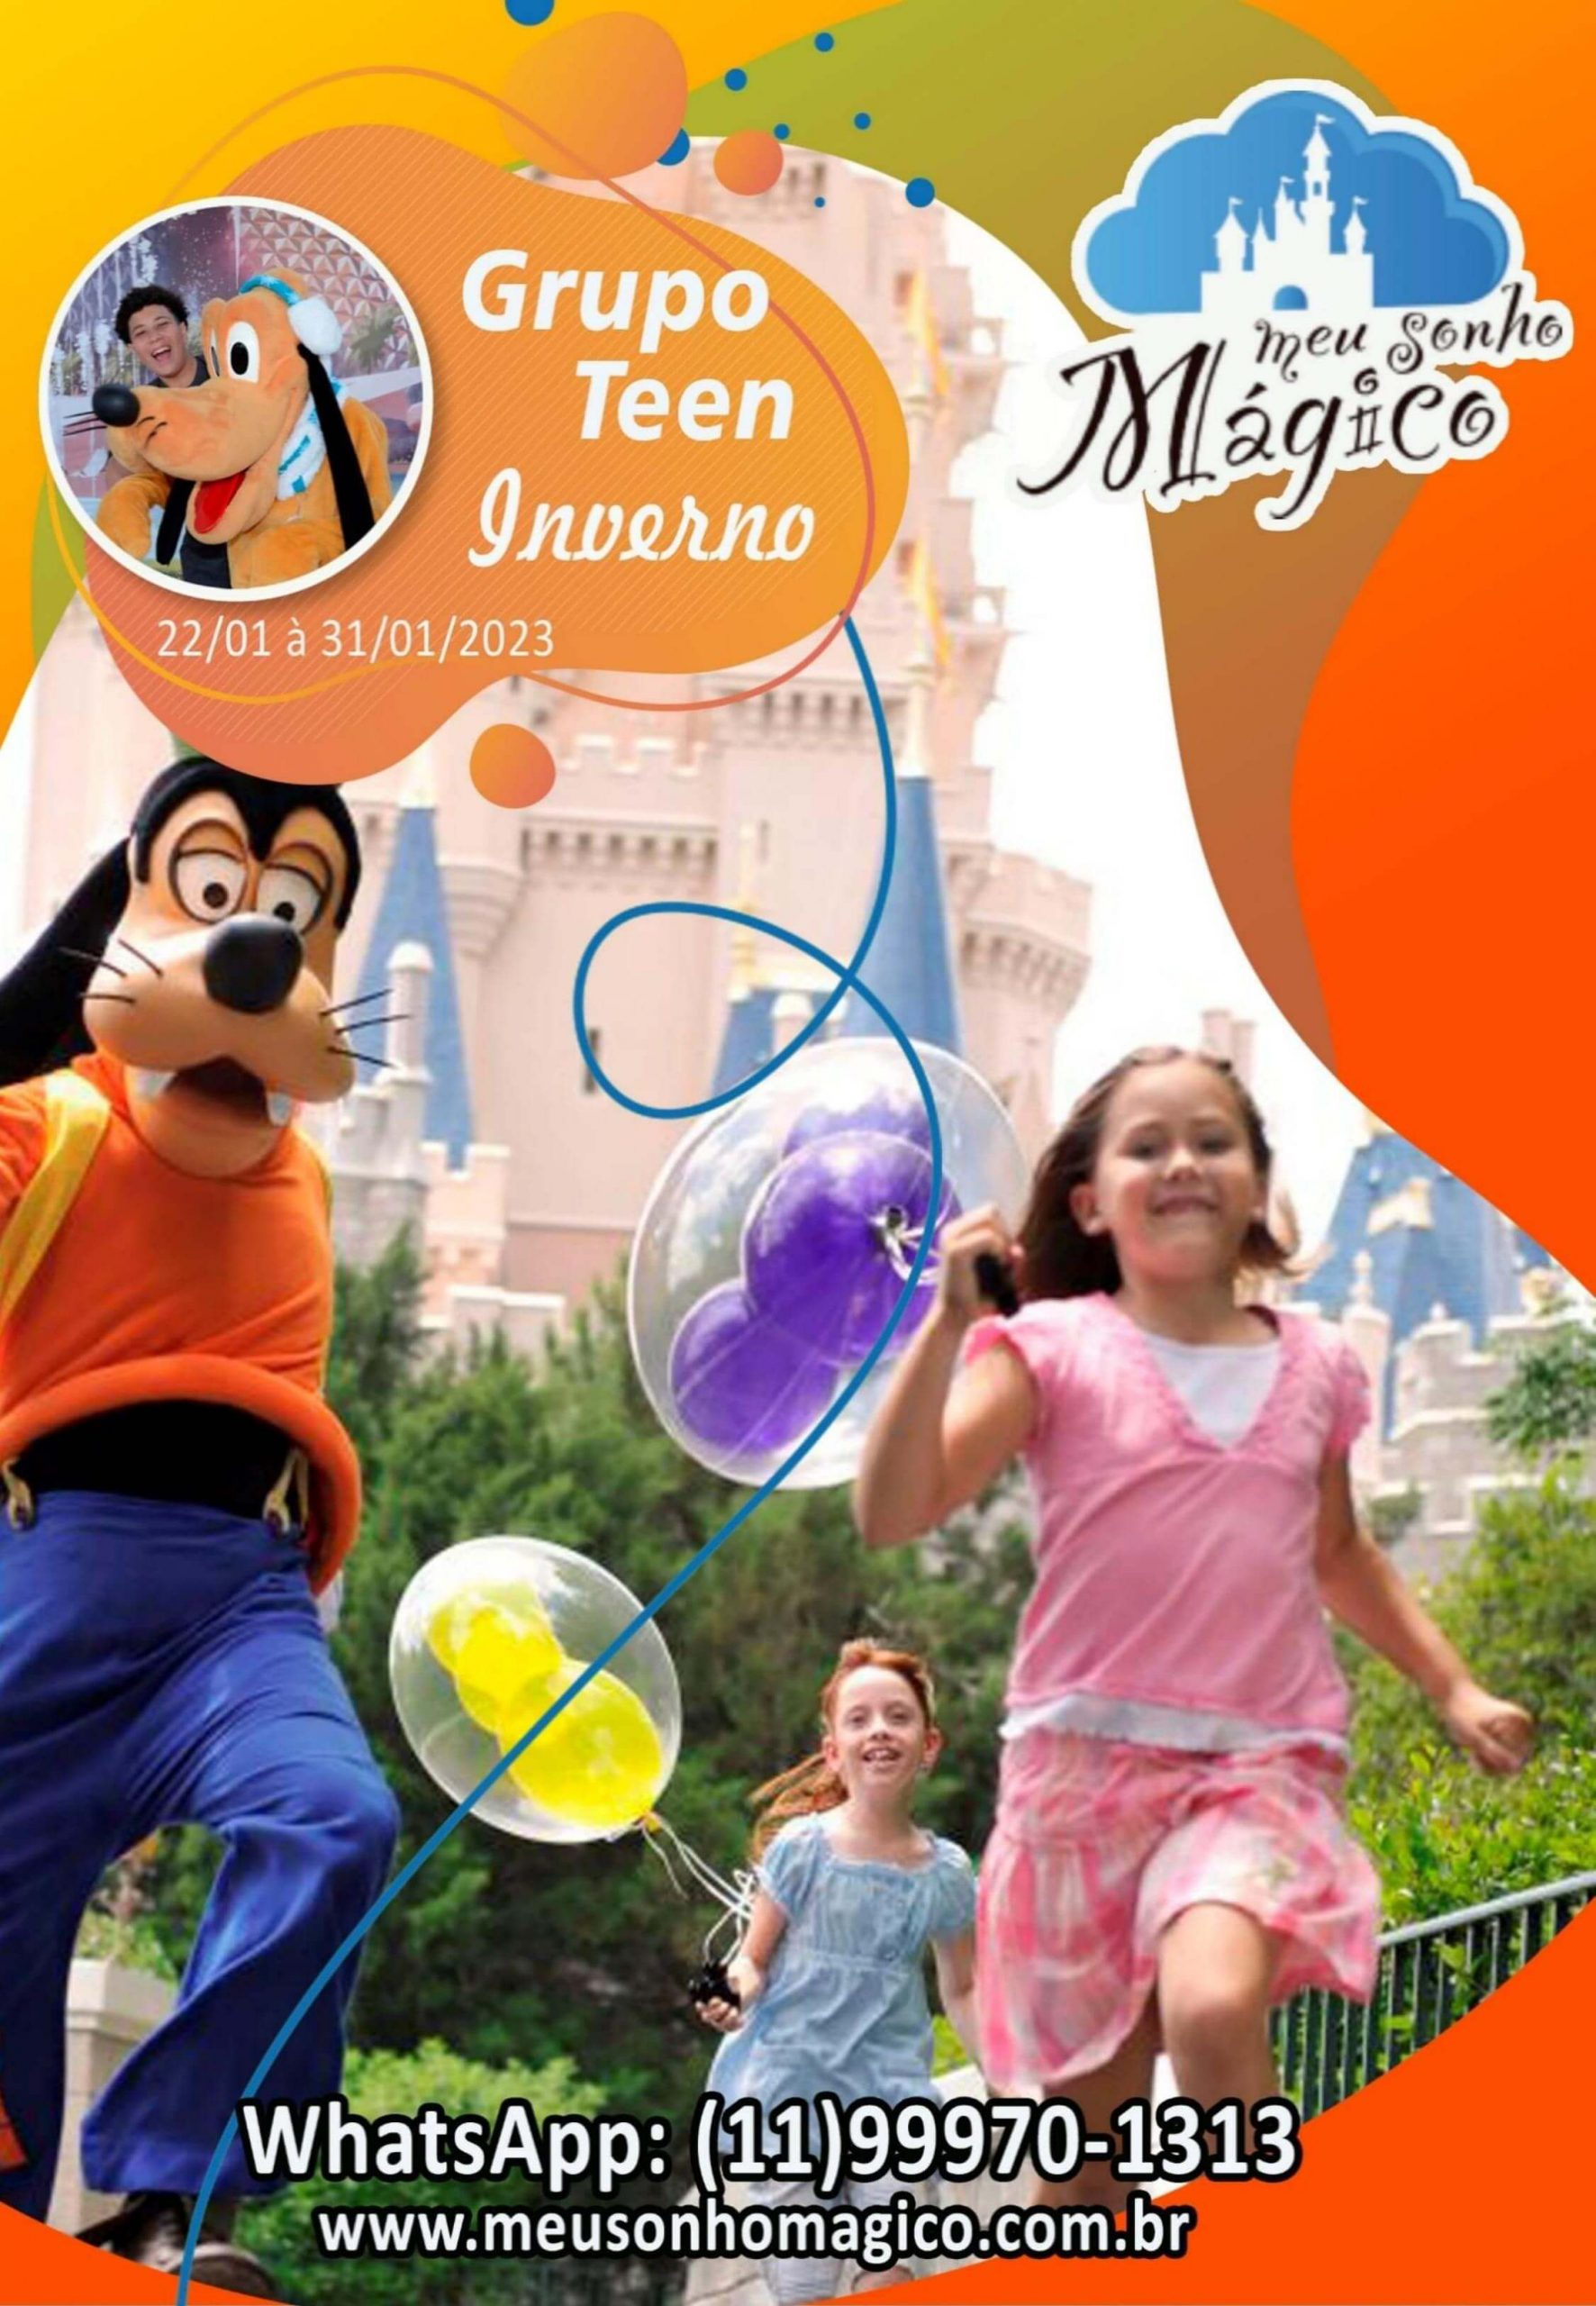 Grupo Teen Inverno - Disney Janeiro 2023 1